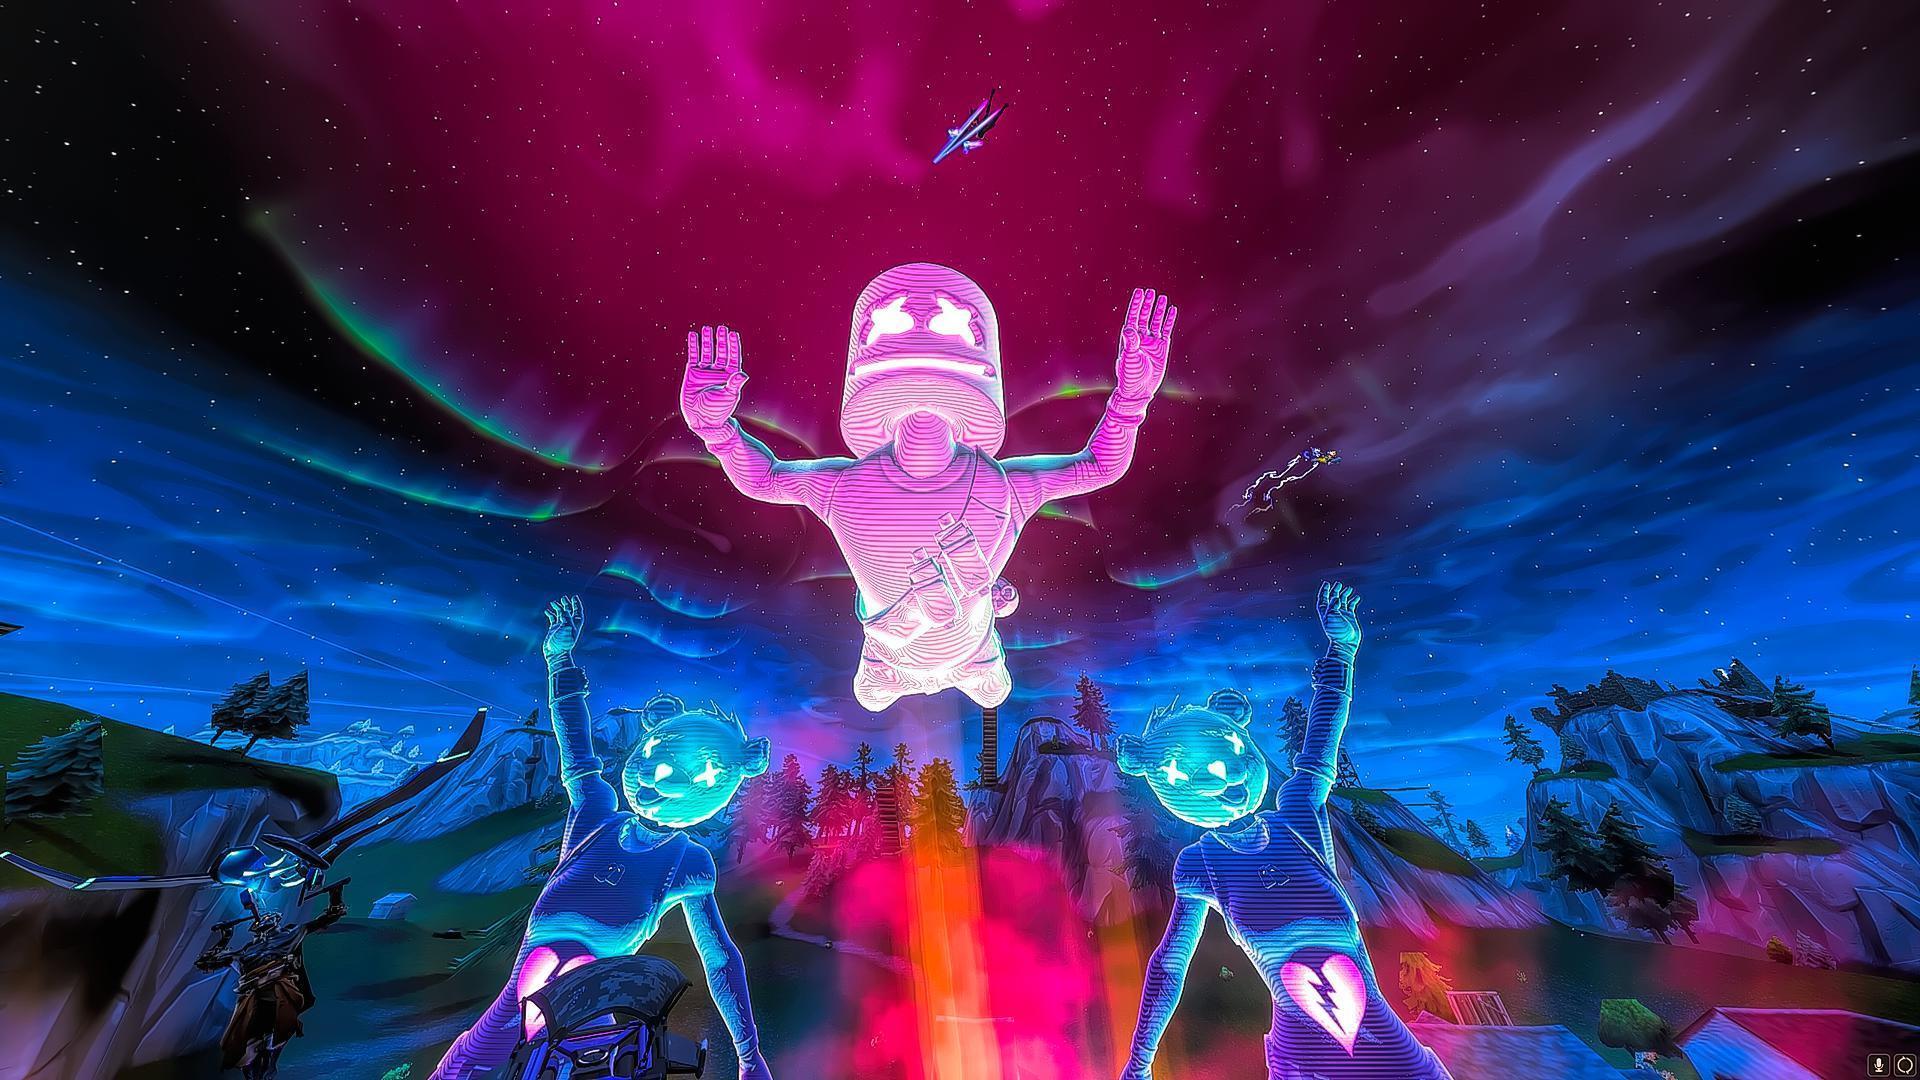 Fortnite Marshmello Wallpaper Hd Concert Live Event ...